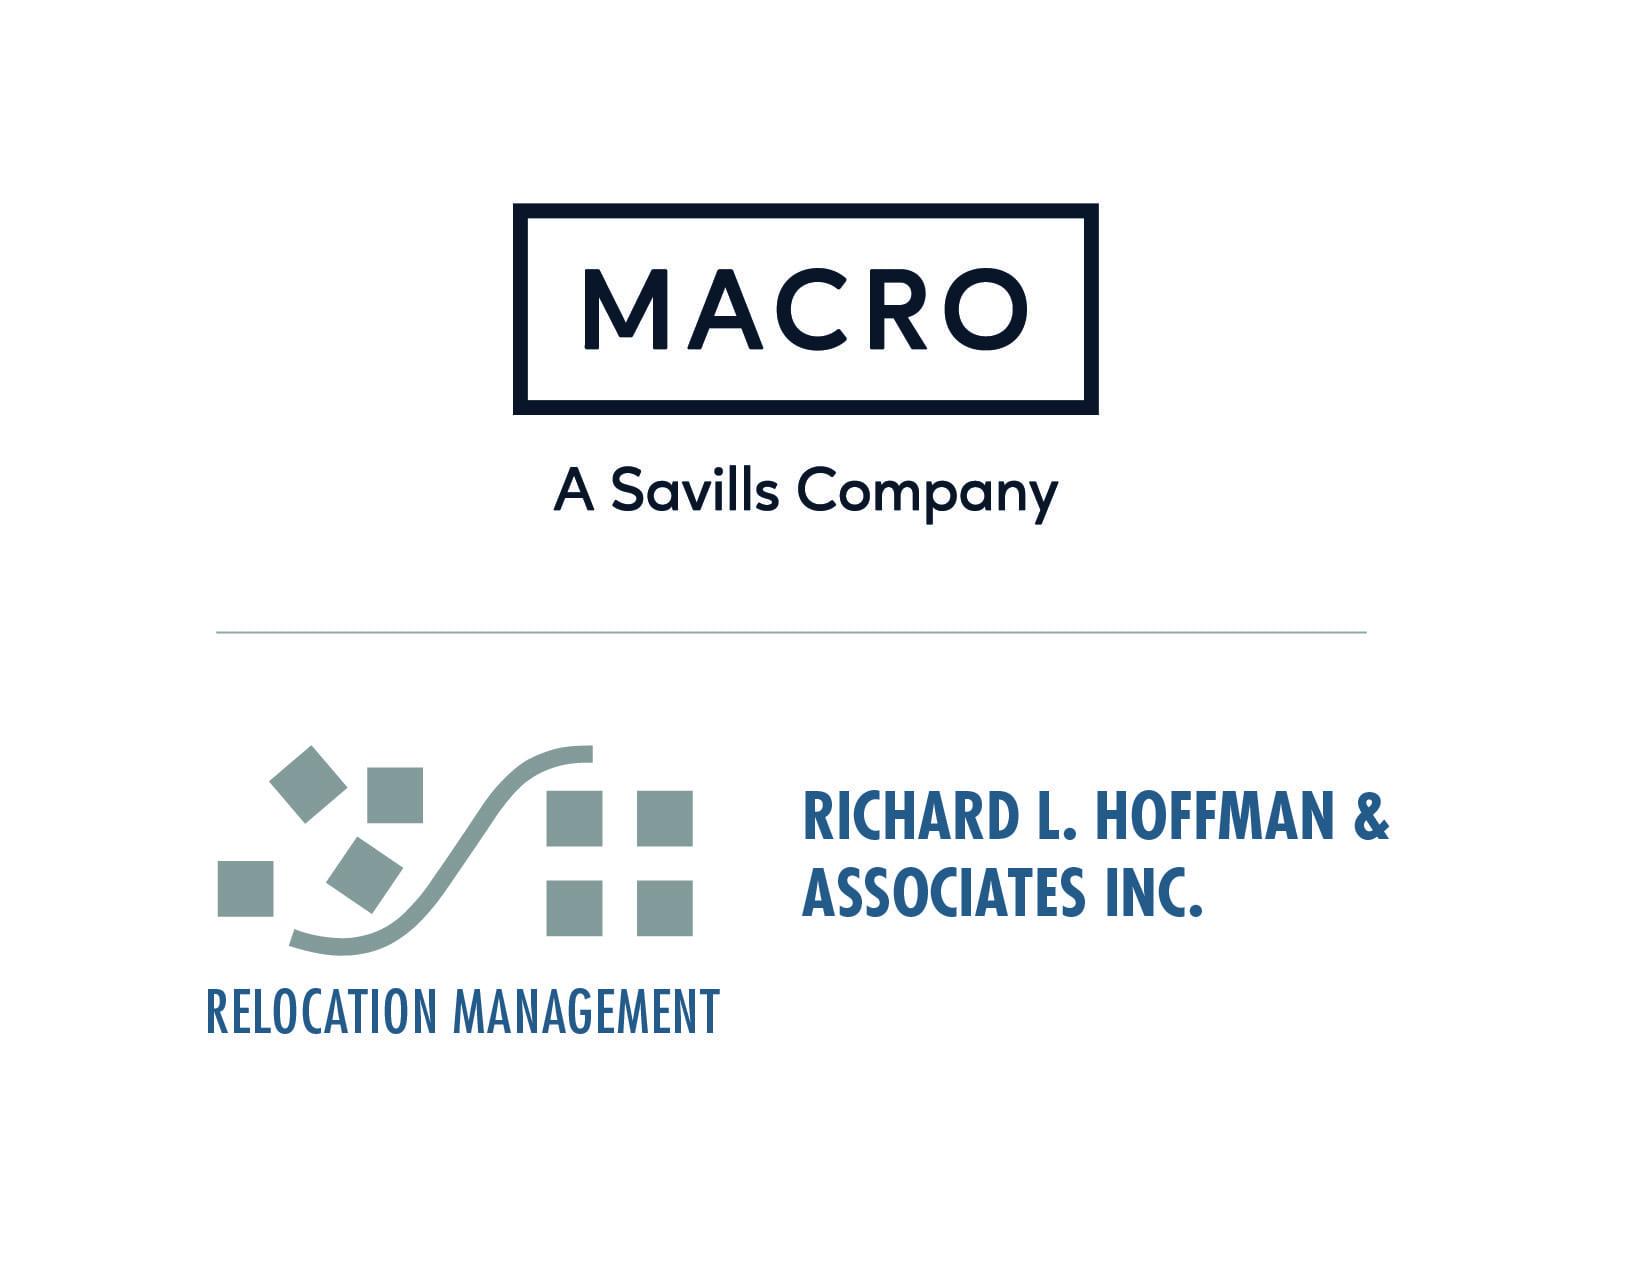 Macro/Richard L. Hoffman & Associates logo